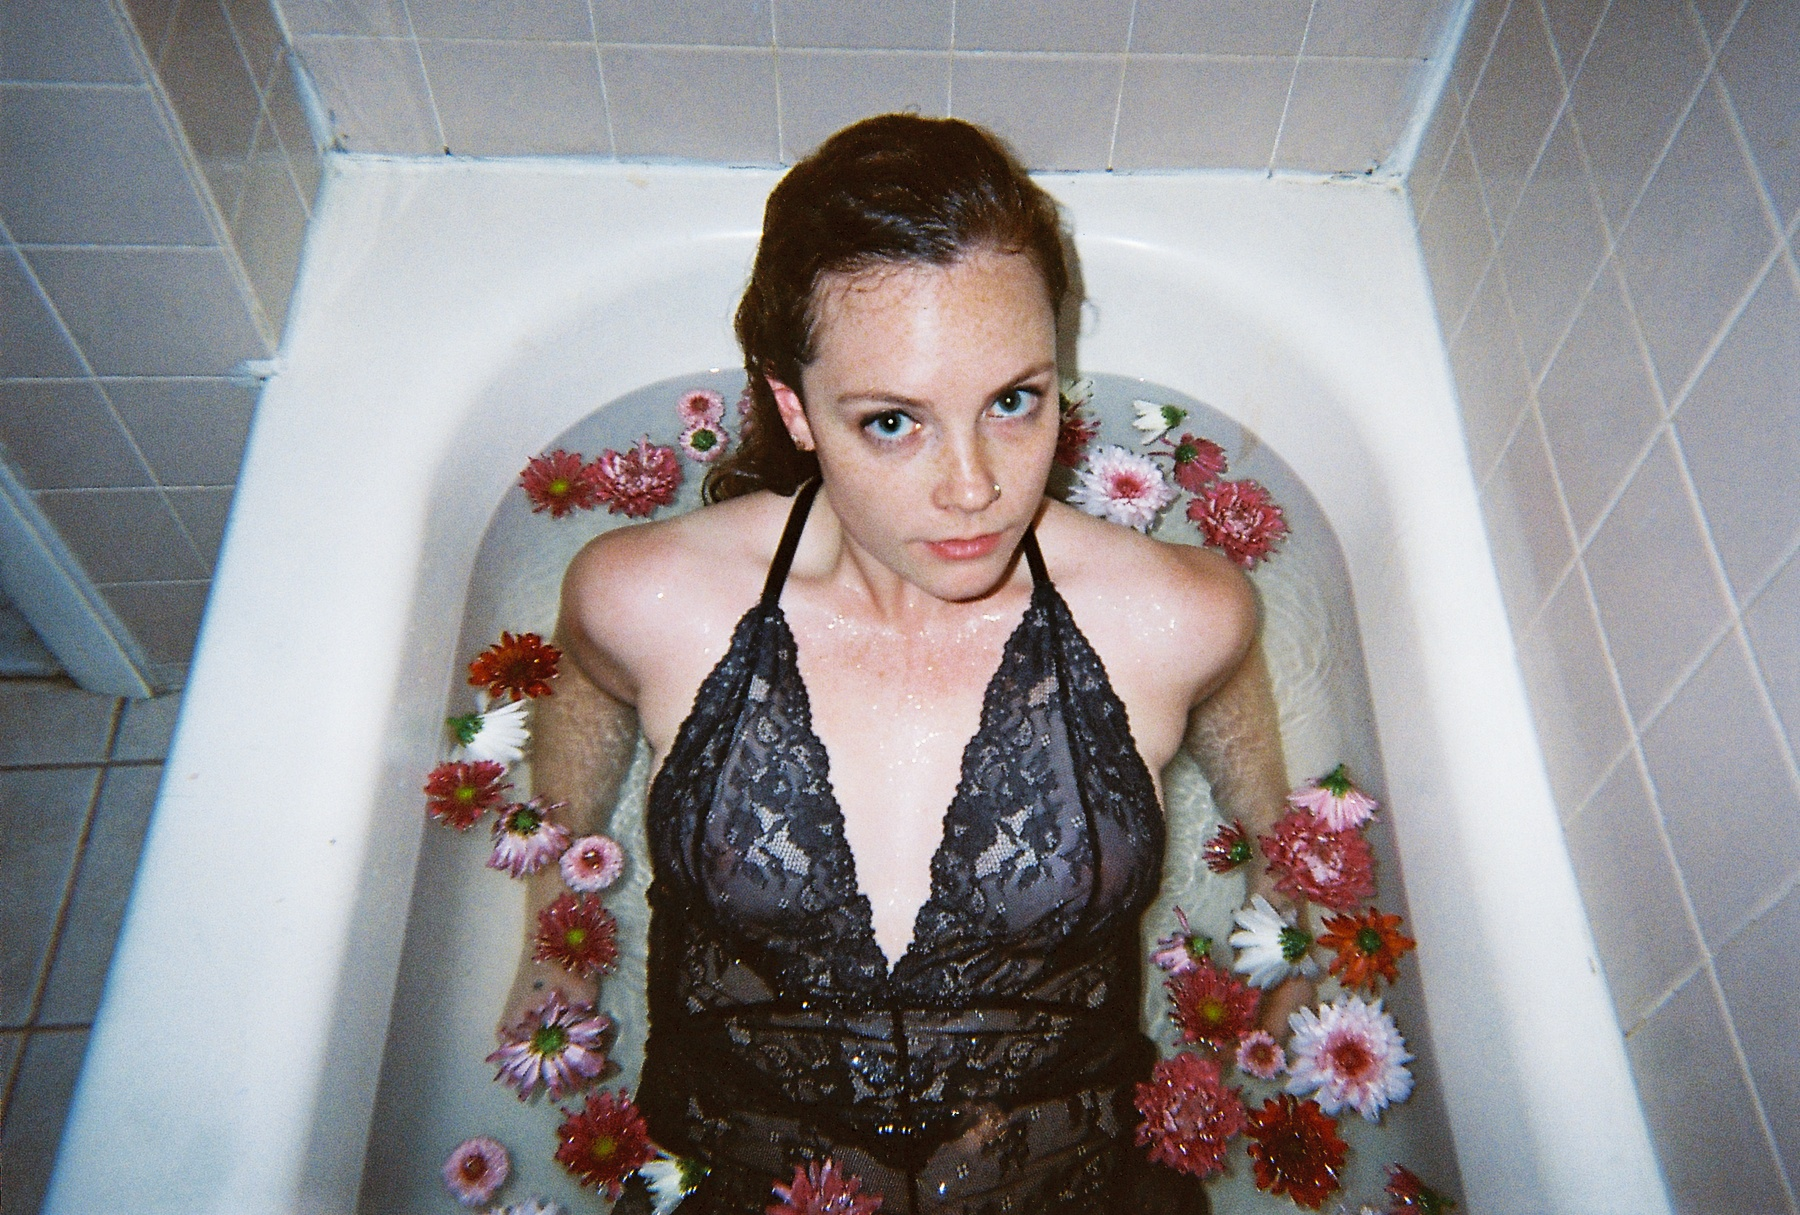 bathtub6.jpg